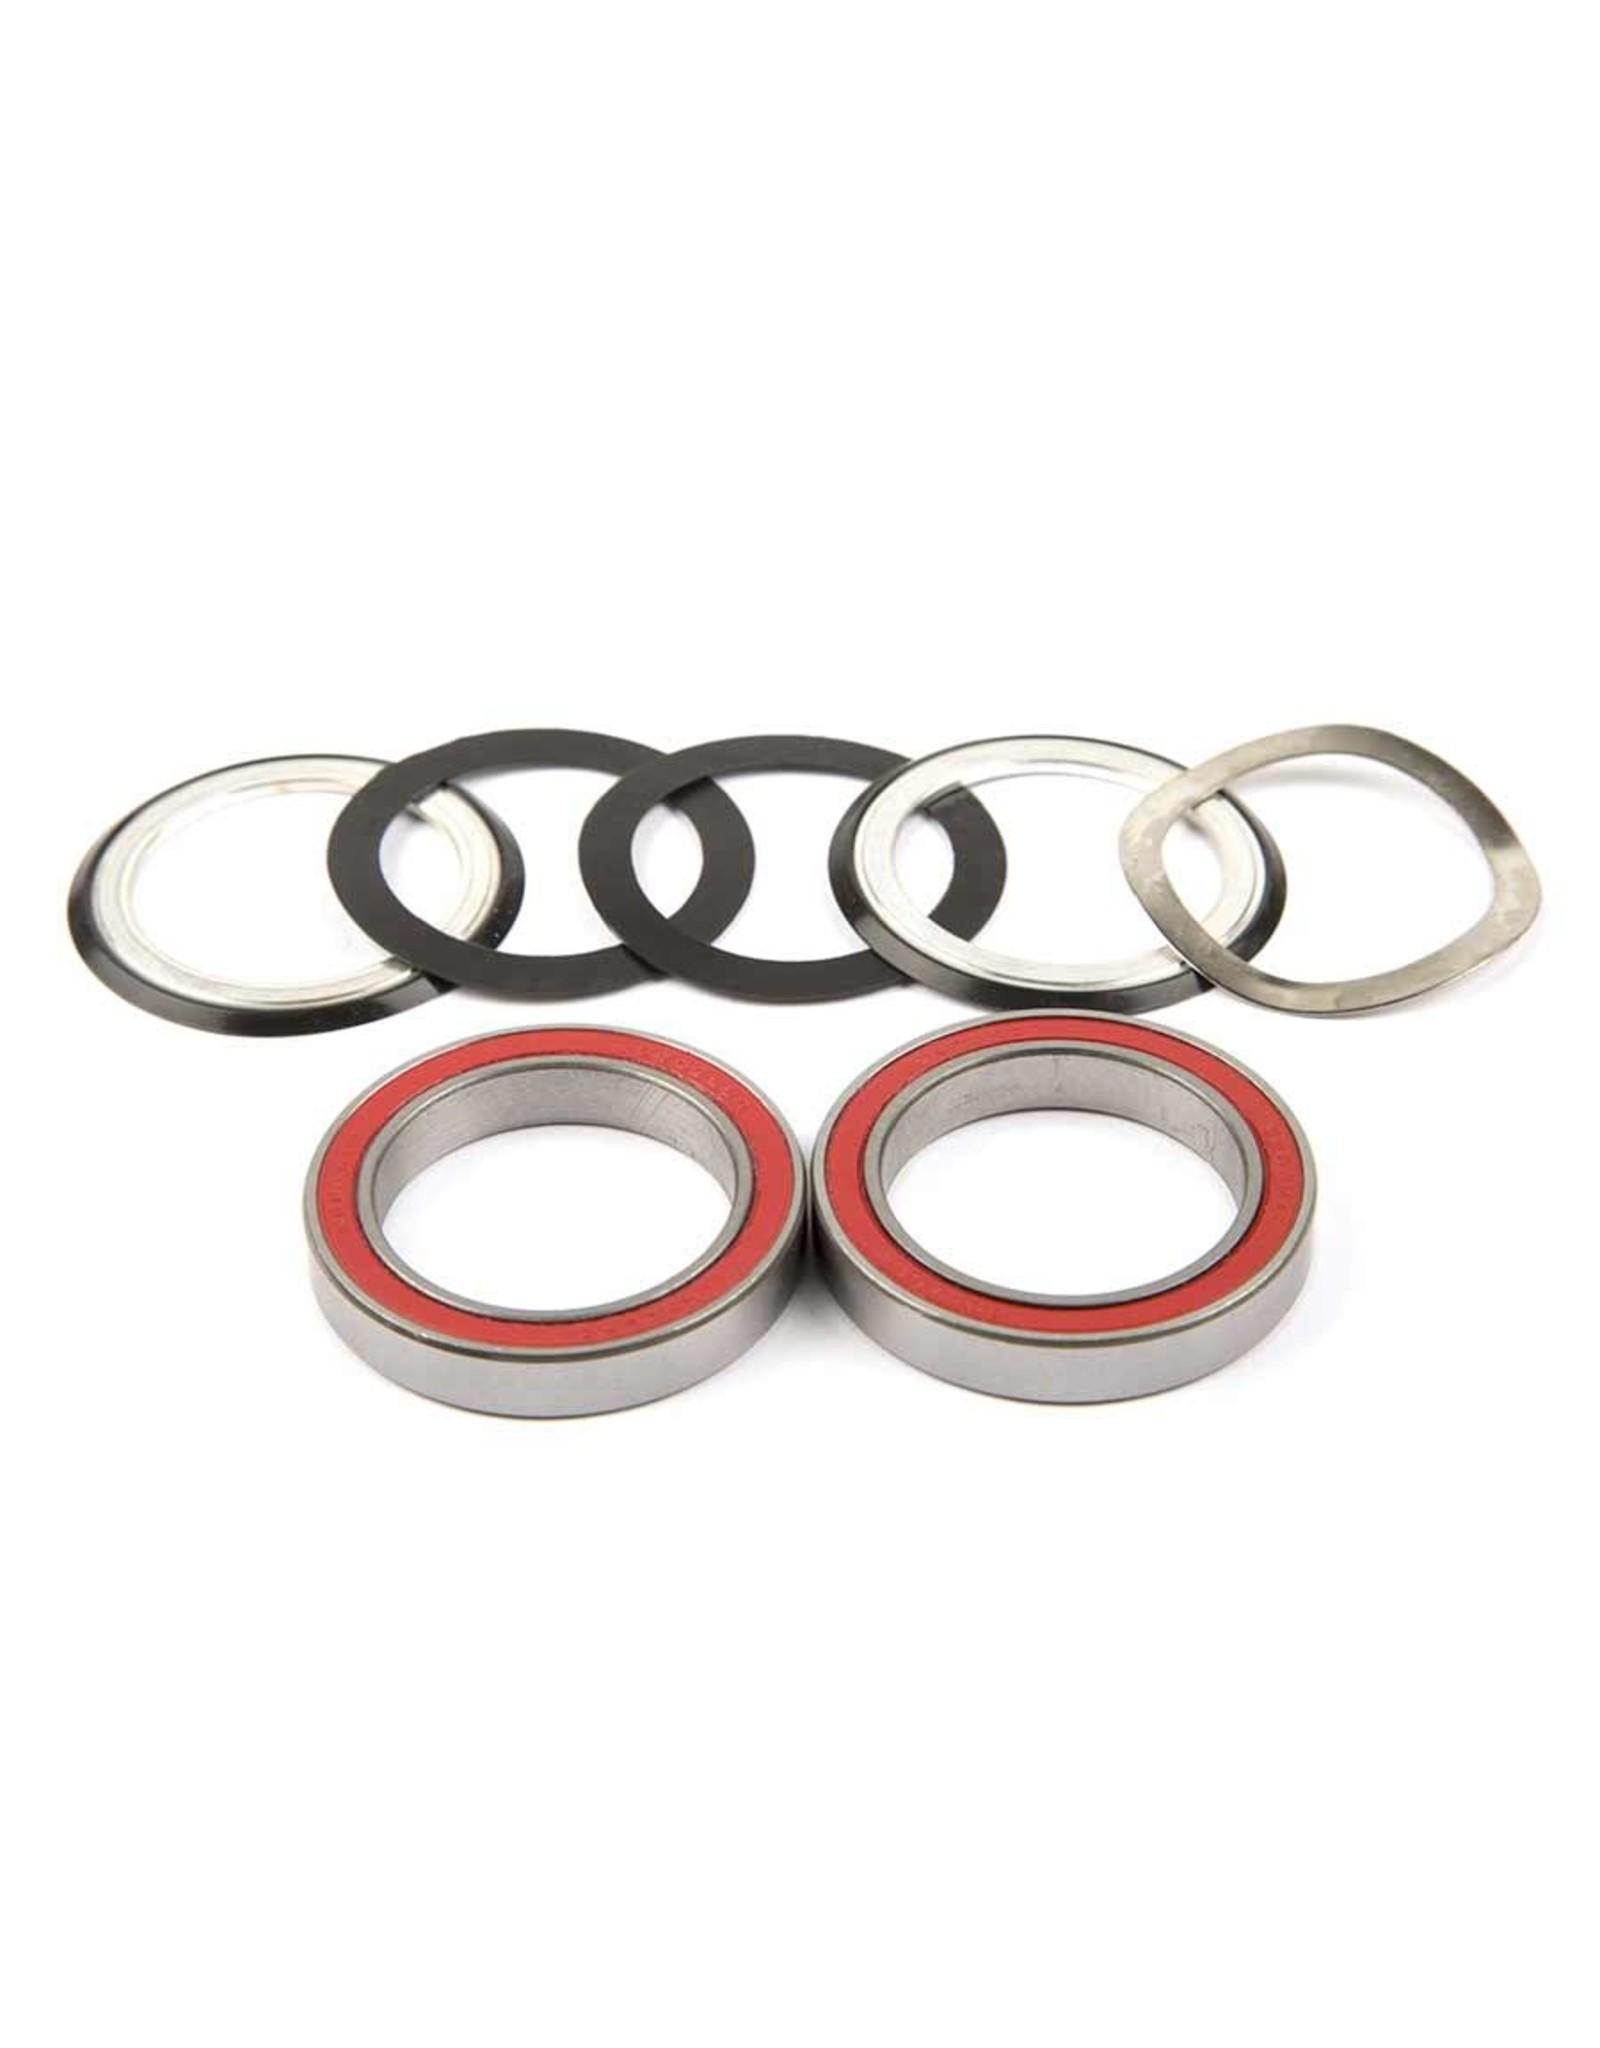 Enduro, Hybrid ceramic bearing kit, BB30, With seals and washers